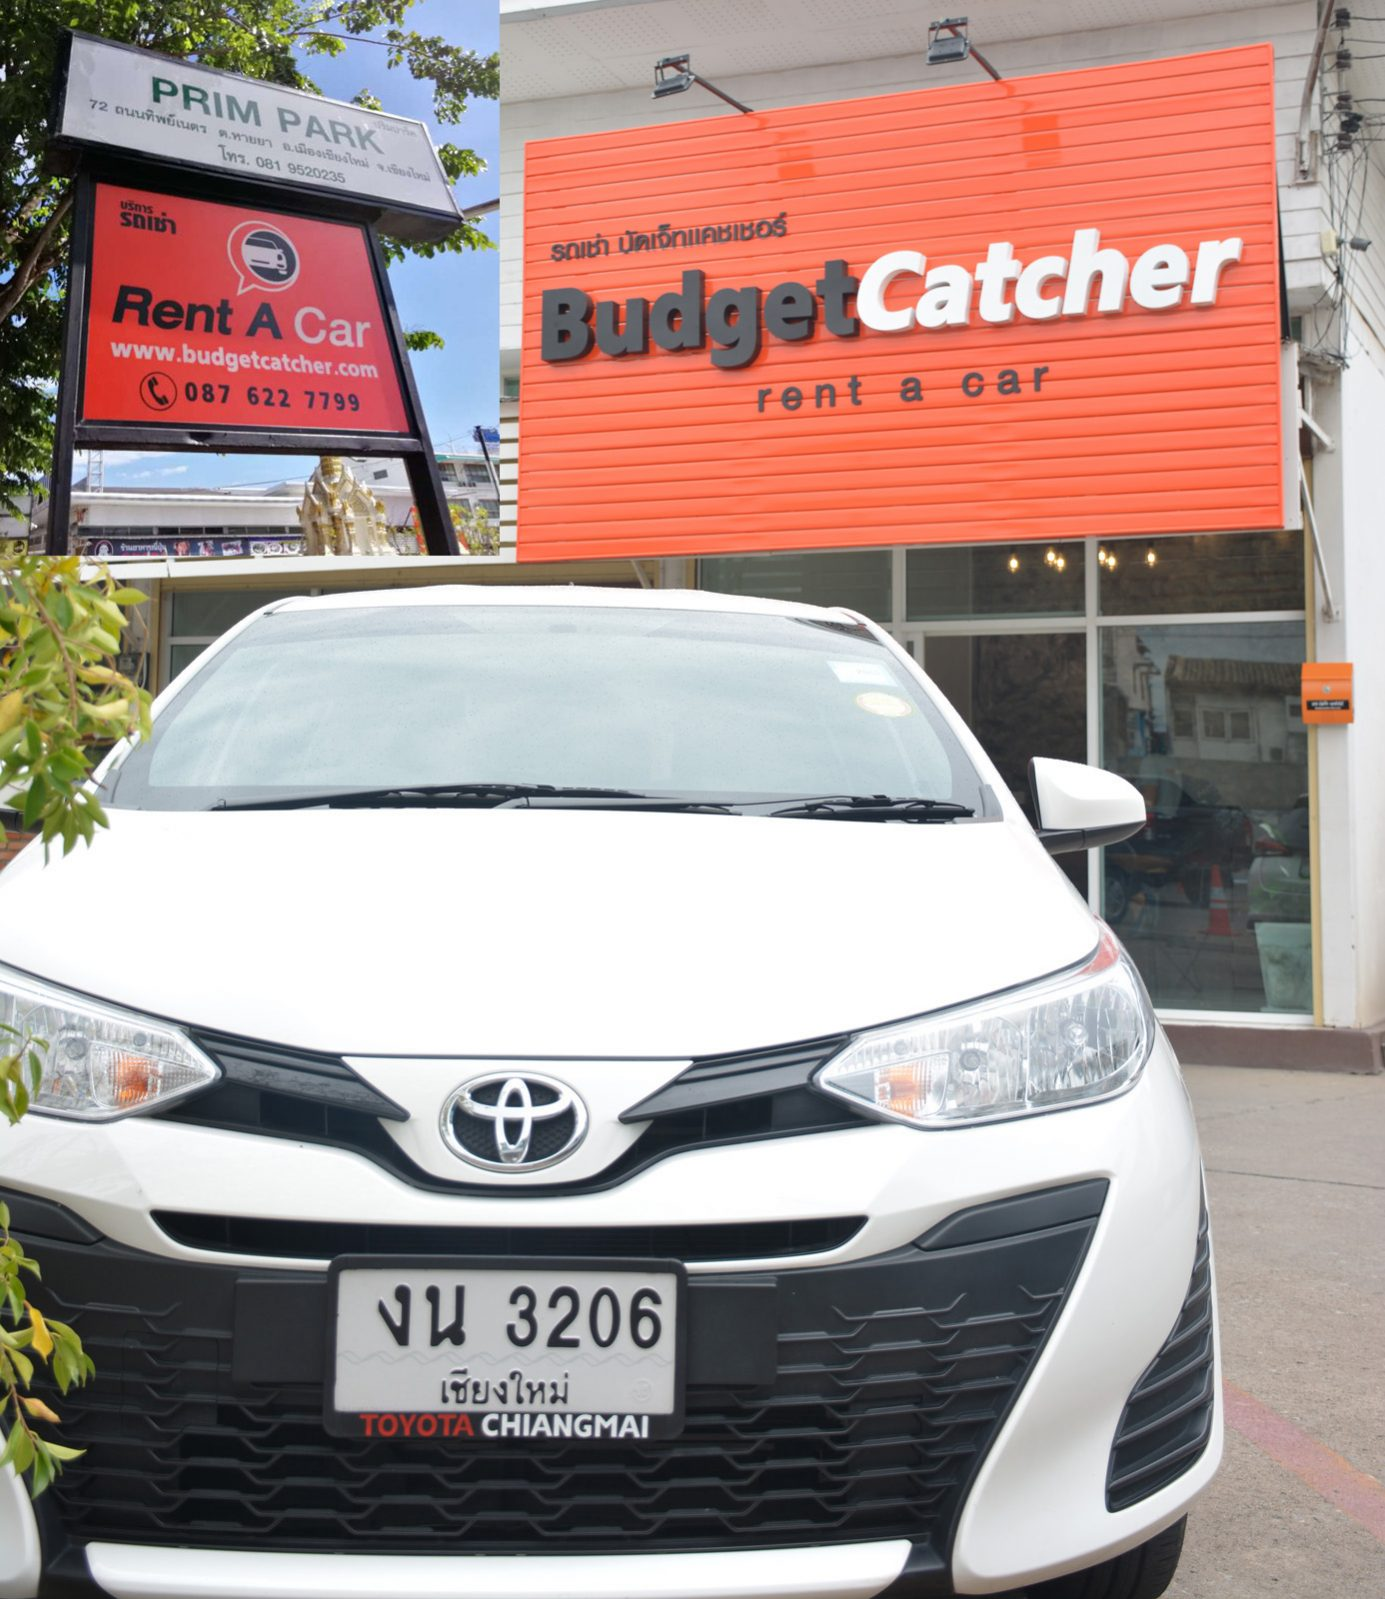 Budgetcatcher Mietwagen Niederlassung Chiang Mai Thailand